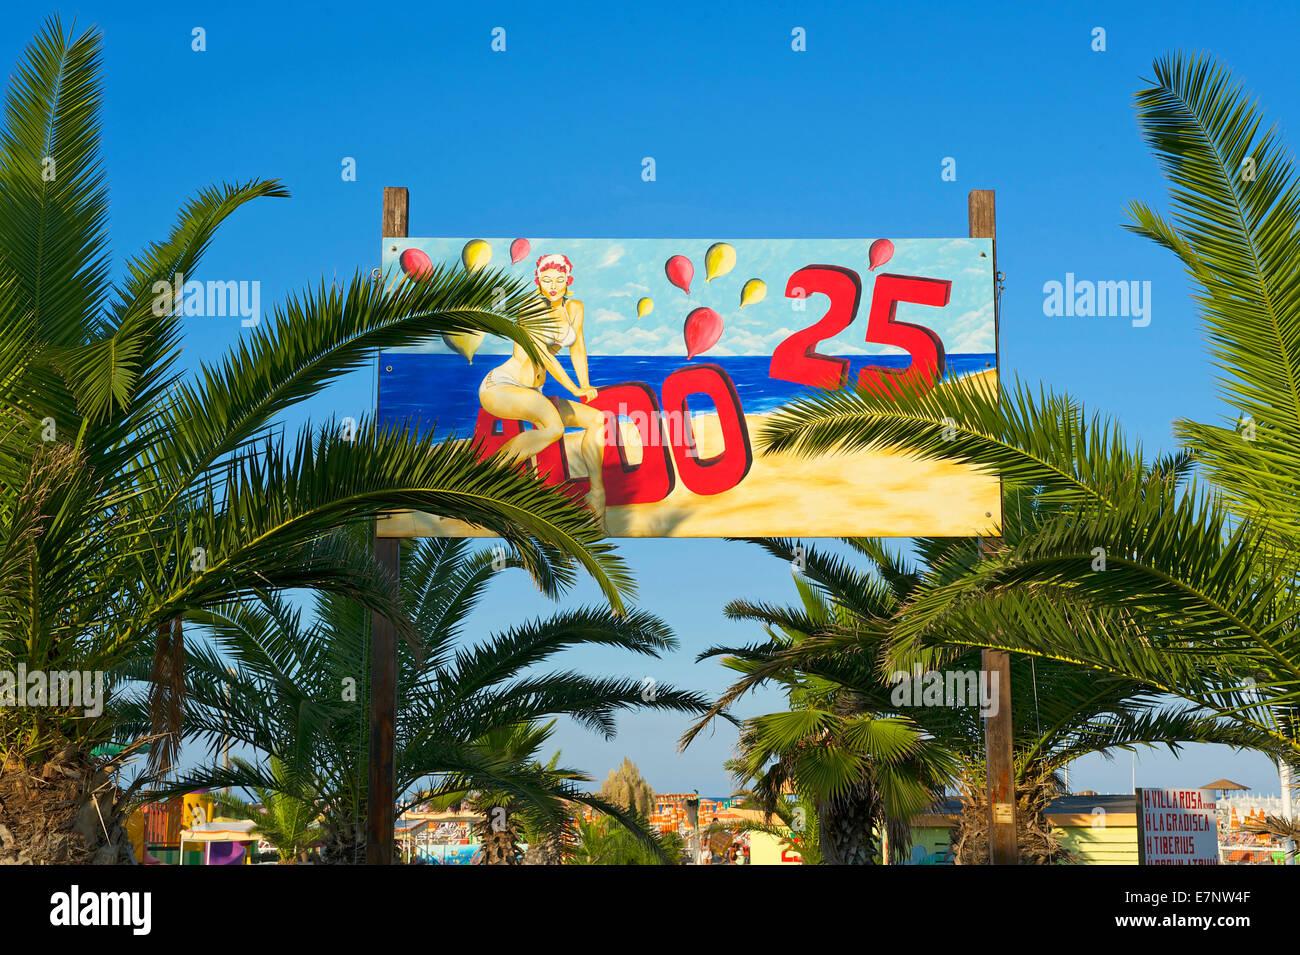 Adriatic, Italy, Europe, outside, day, nobody, Emilia-Romagna, beach, seashore, Rimini, Lido, tip, sign, - Stock Image